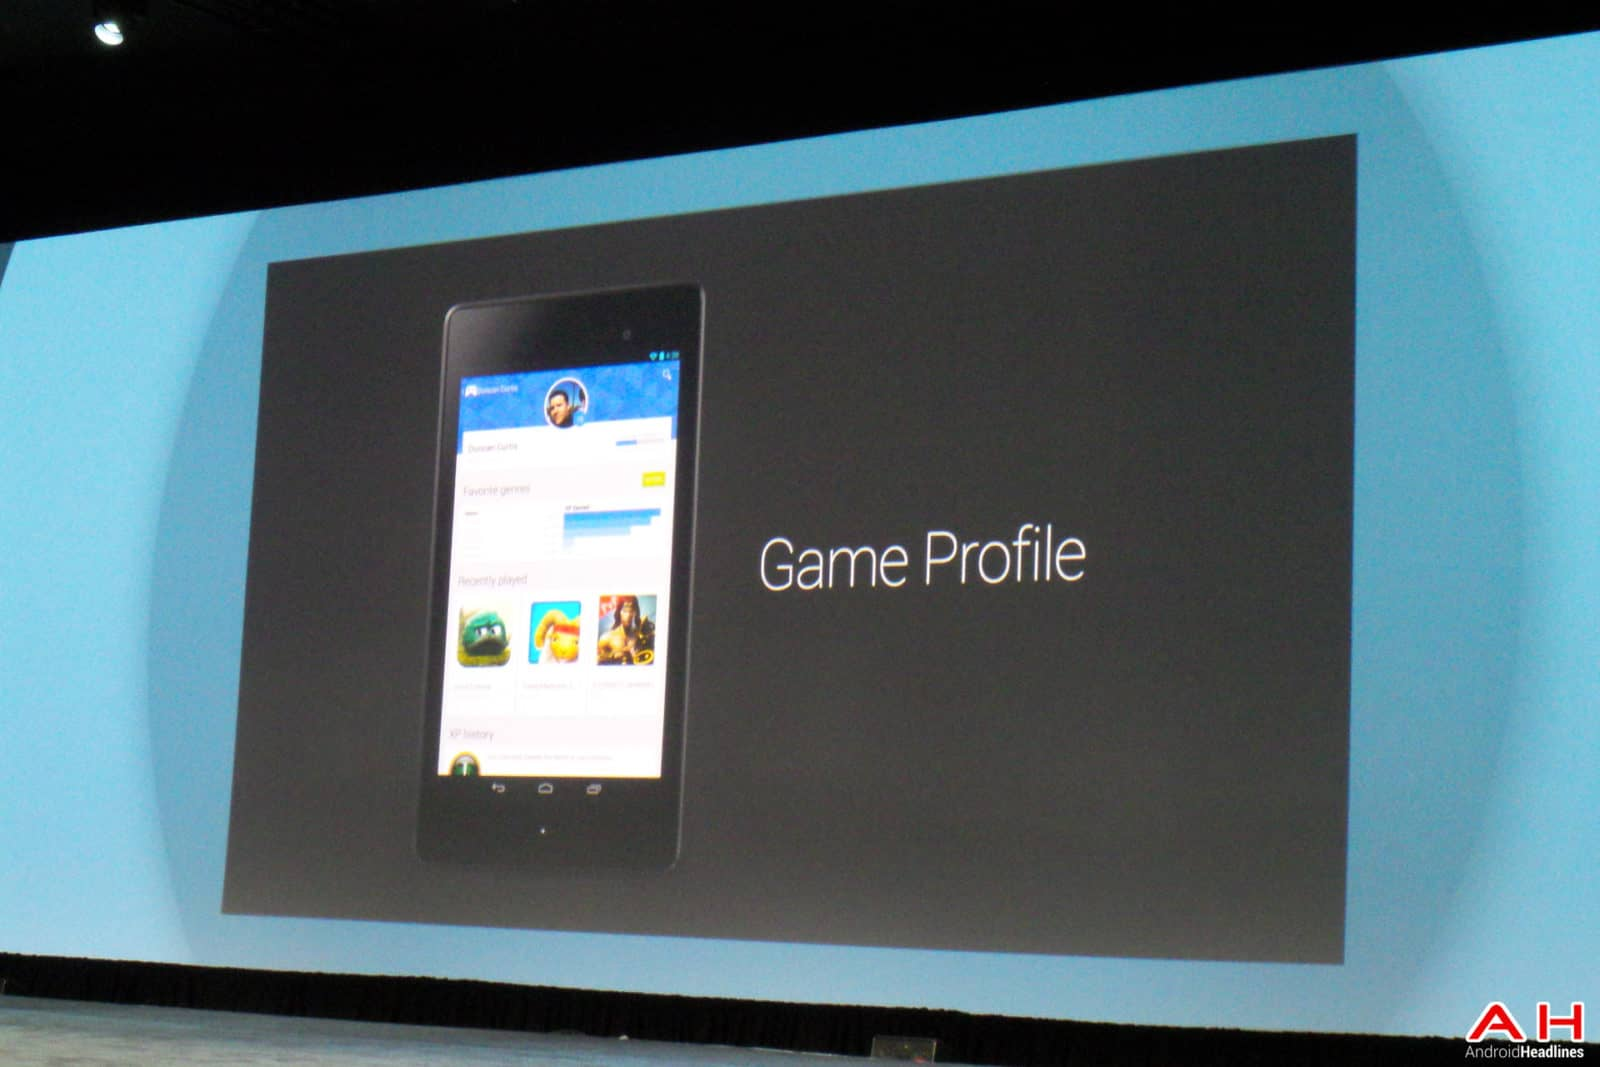 AH Google IO 2014 (904 of 8) Games